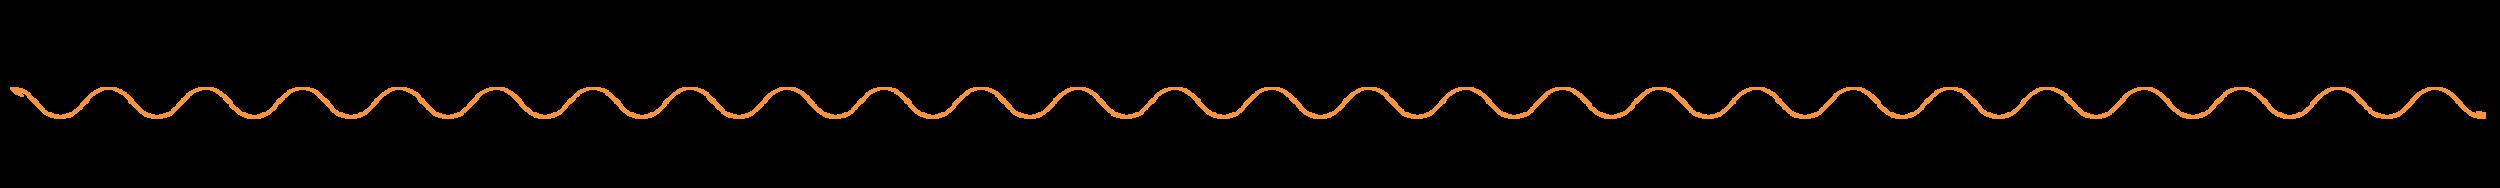 wavy line-01.png